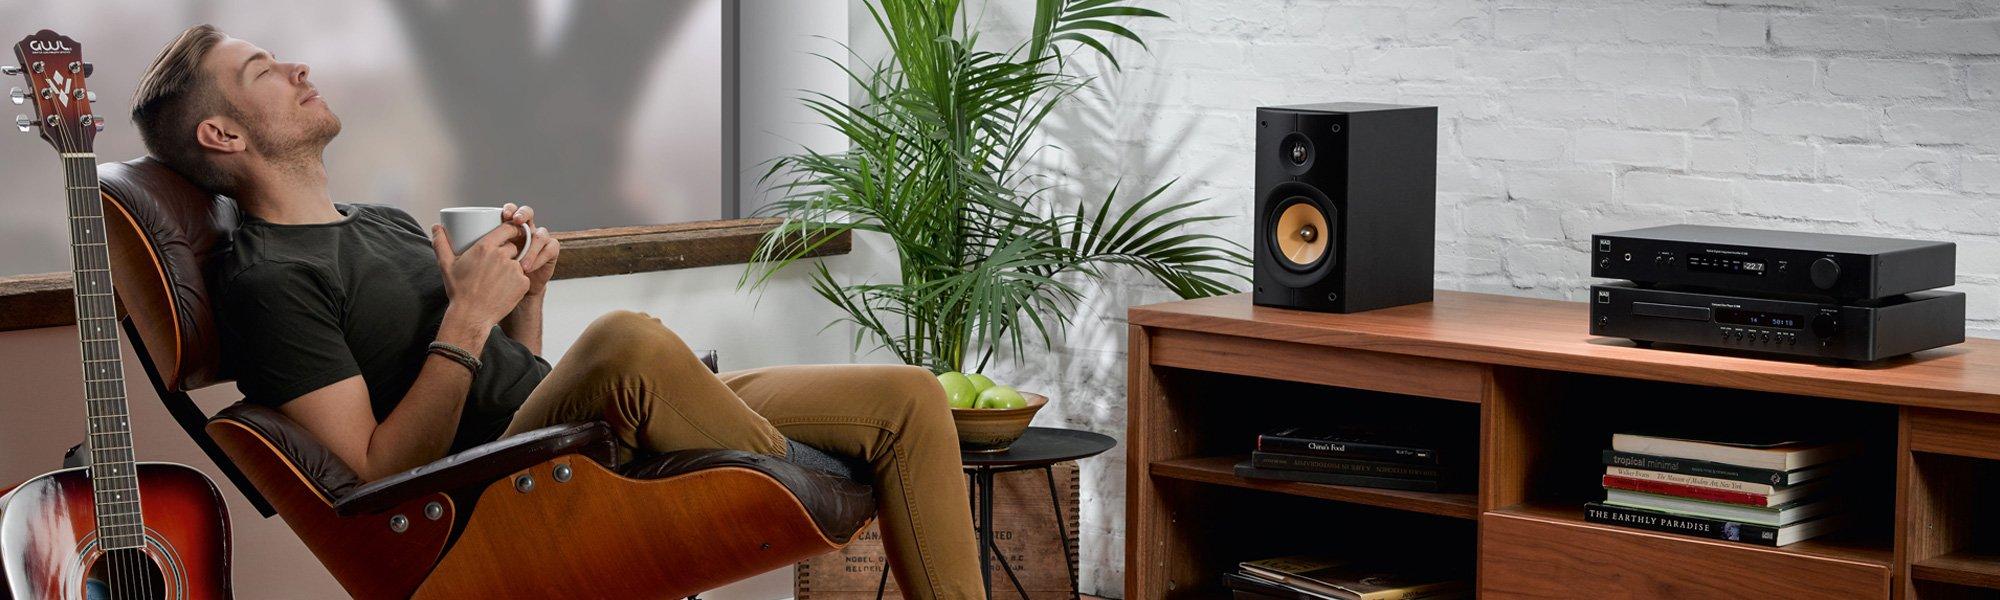 NAD Classic Serie Hifi Elektronik und Audio Streamer